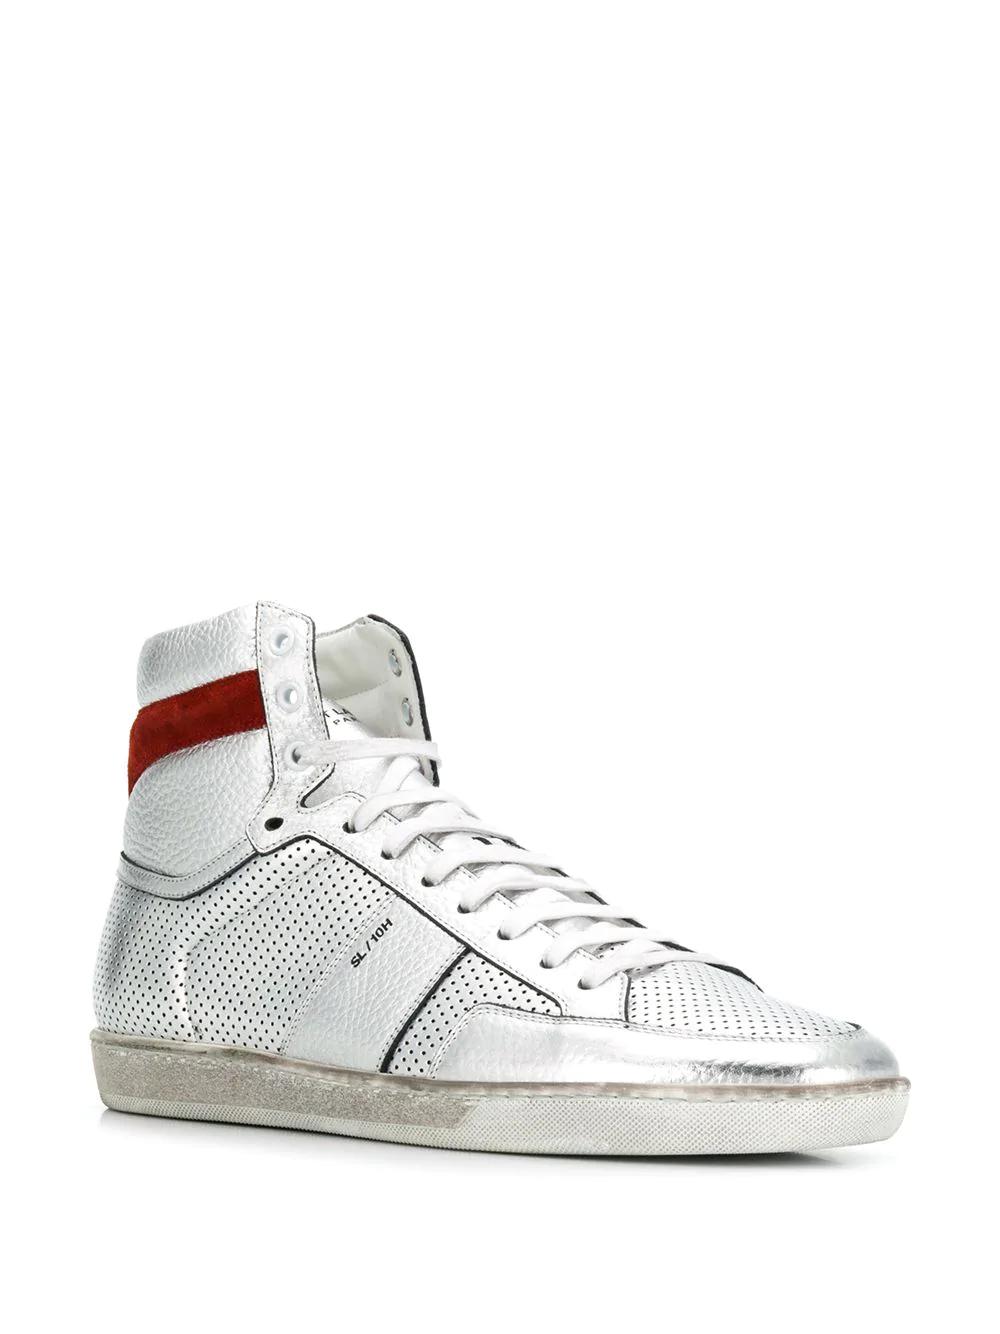 saint laurent sneakers farfetch